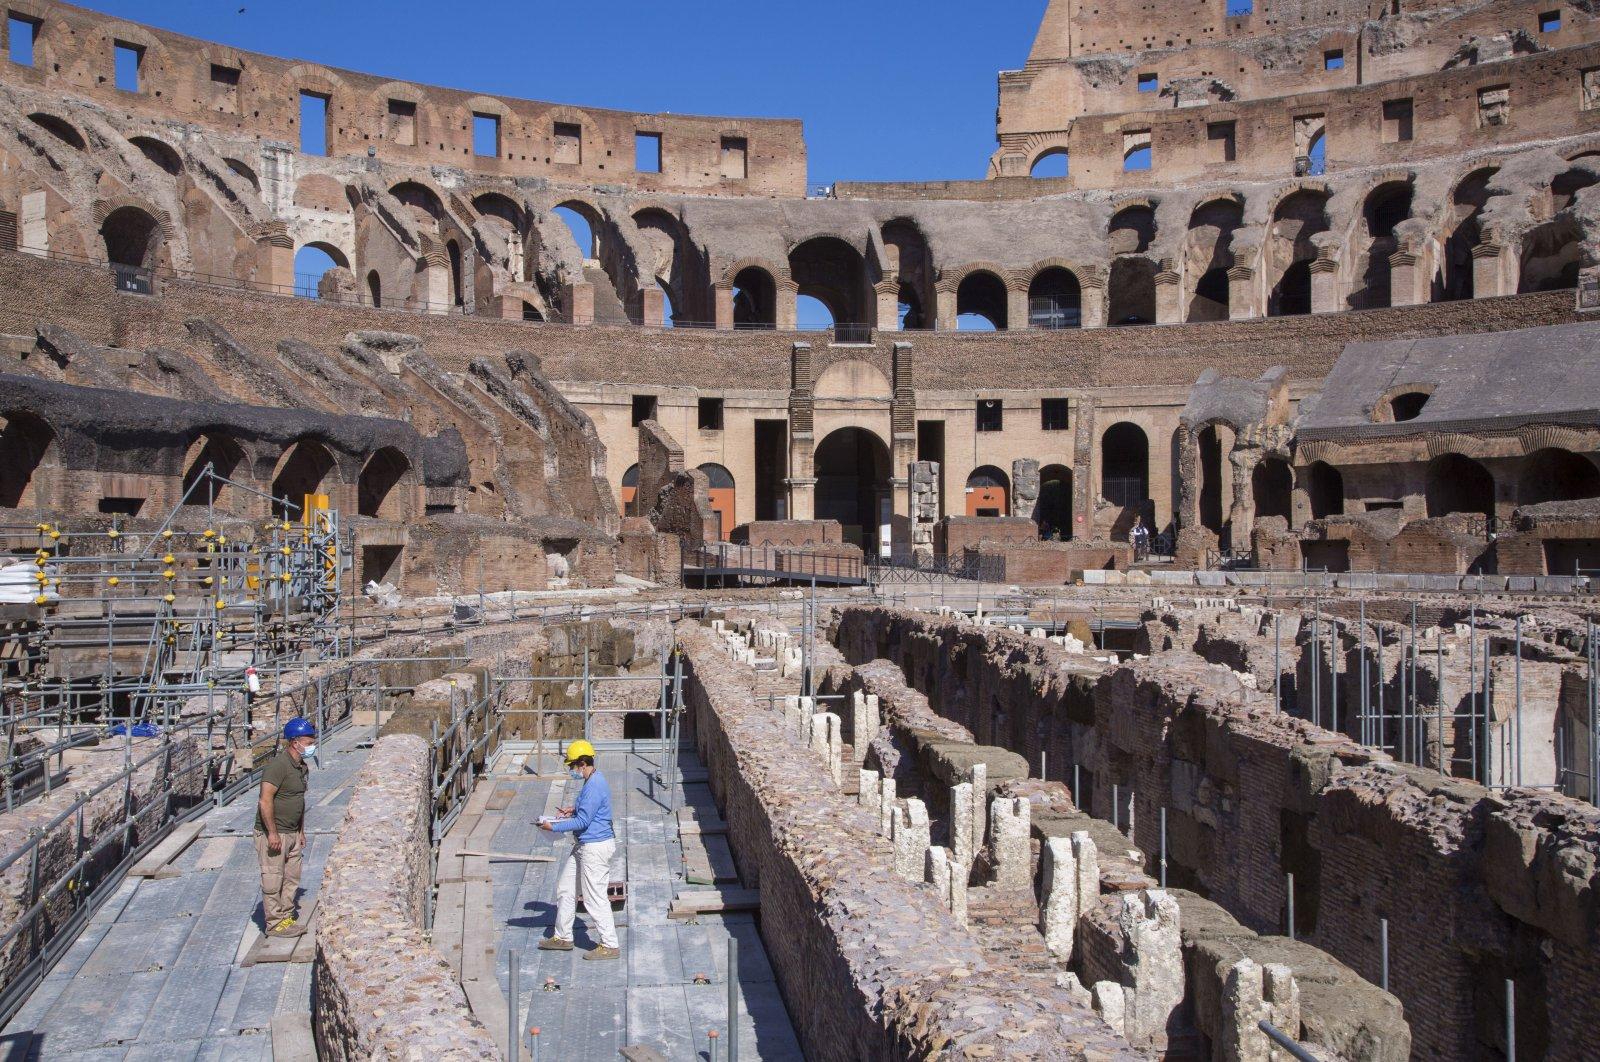 Restorers work inside the Colosseum in Rome, June 1, 2020. (AP Photo)